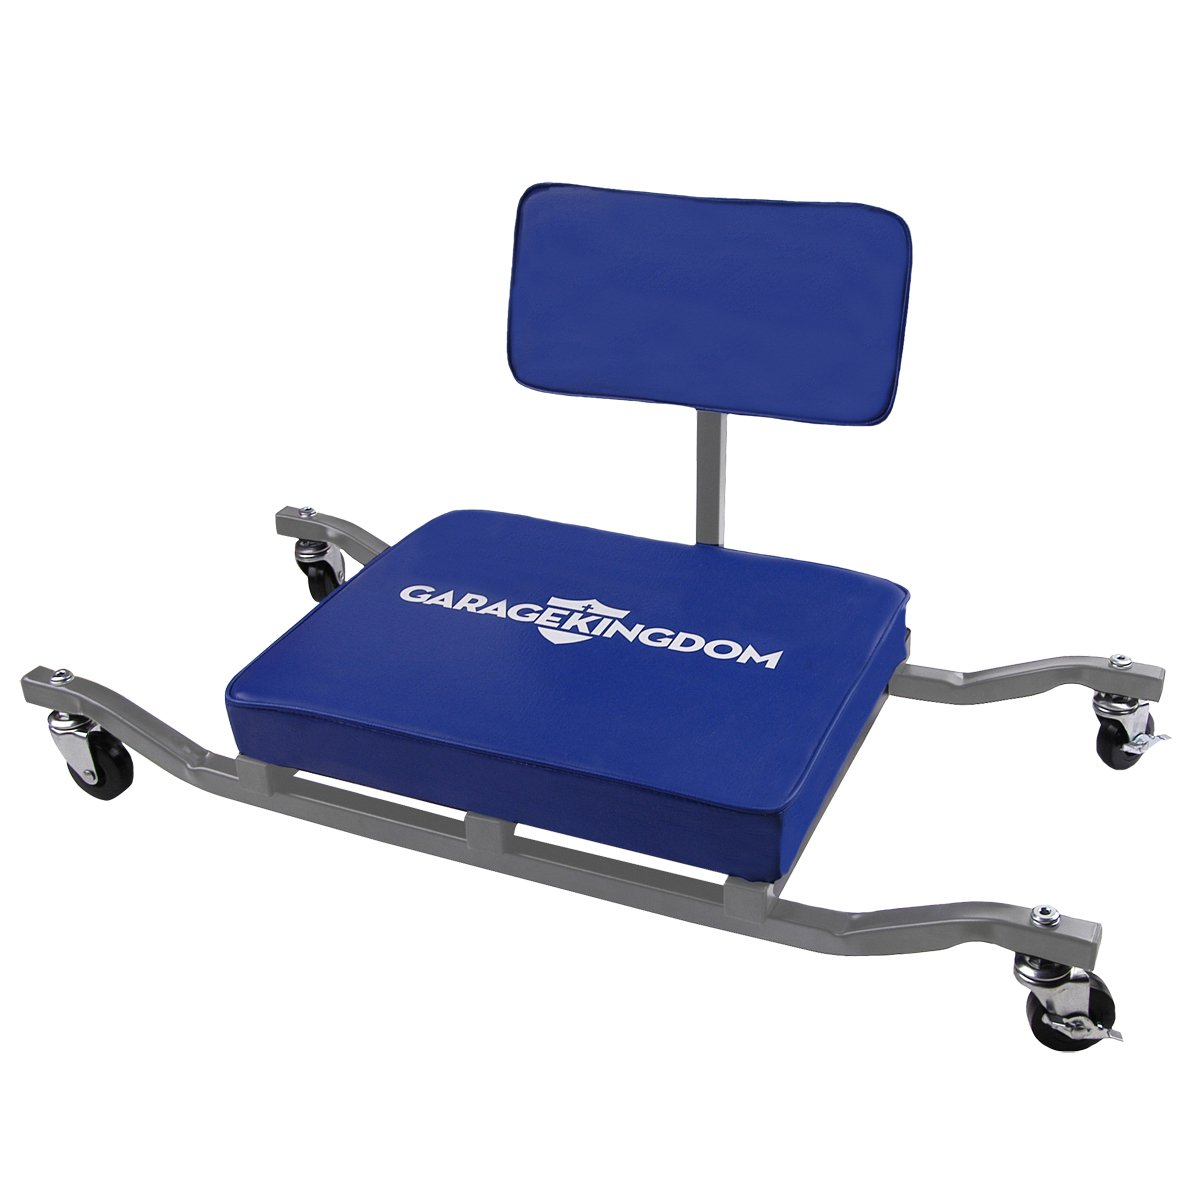 Grip Garage Kingdom Low Profile Creeper Seat